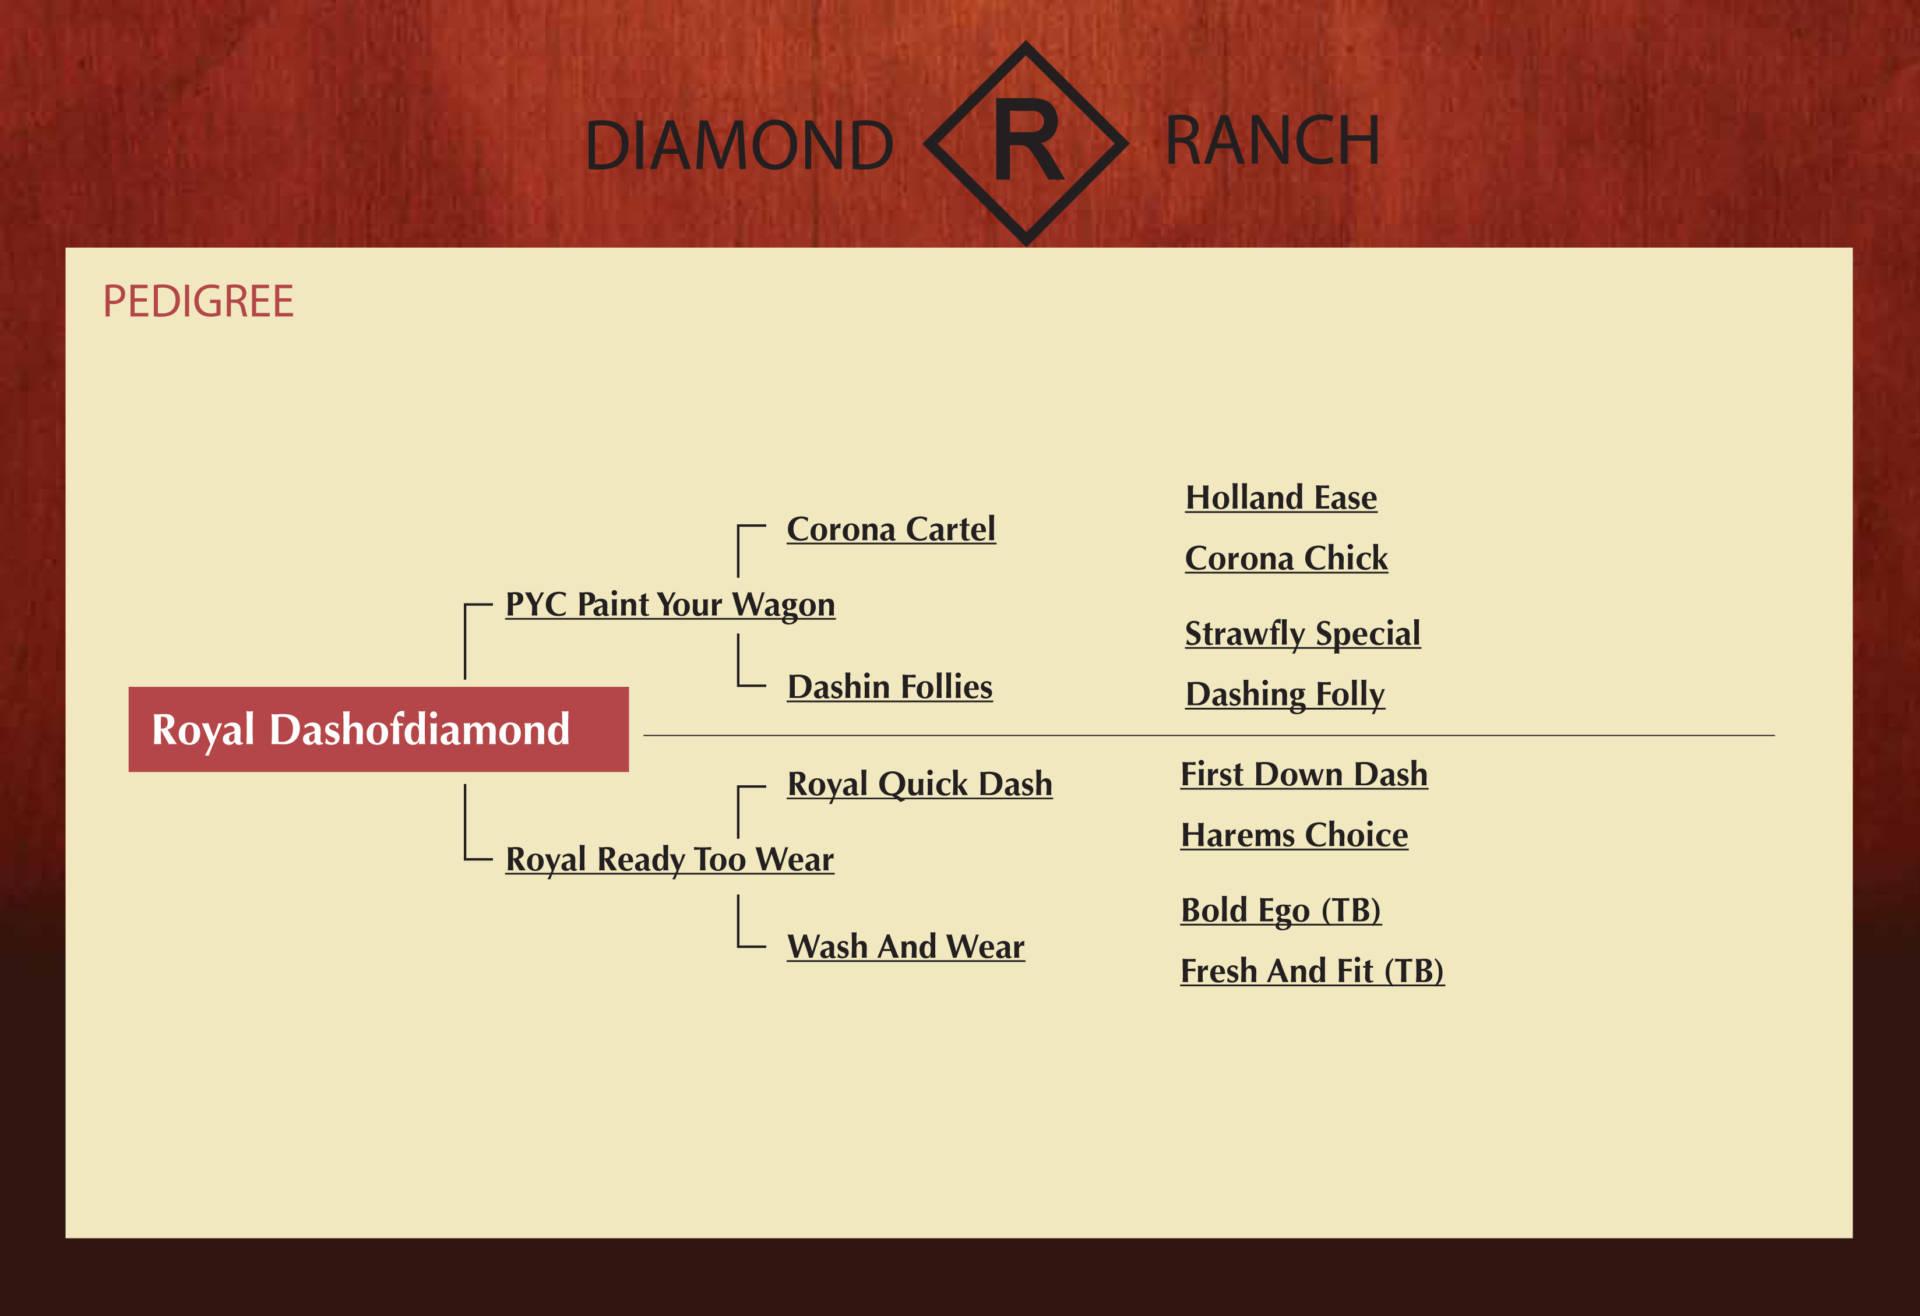 Royal Dashofdiamond - Pedigree